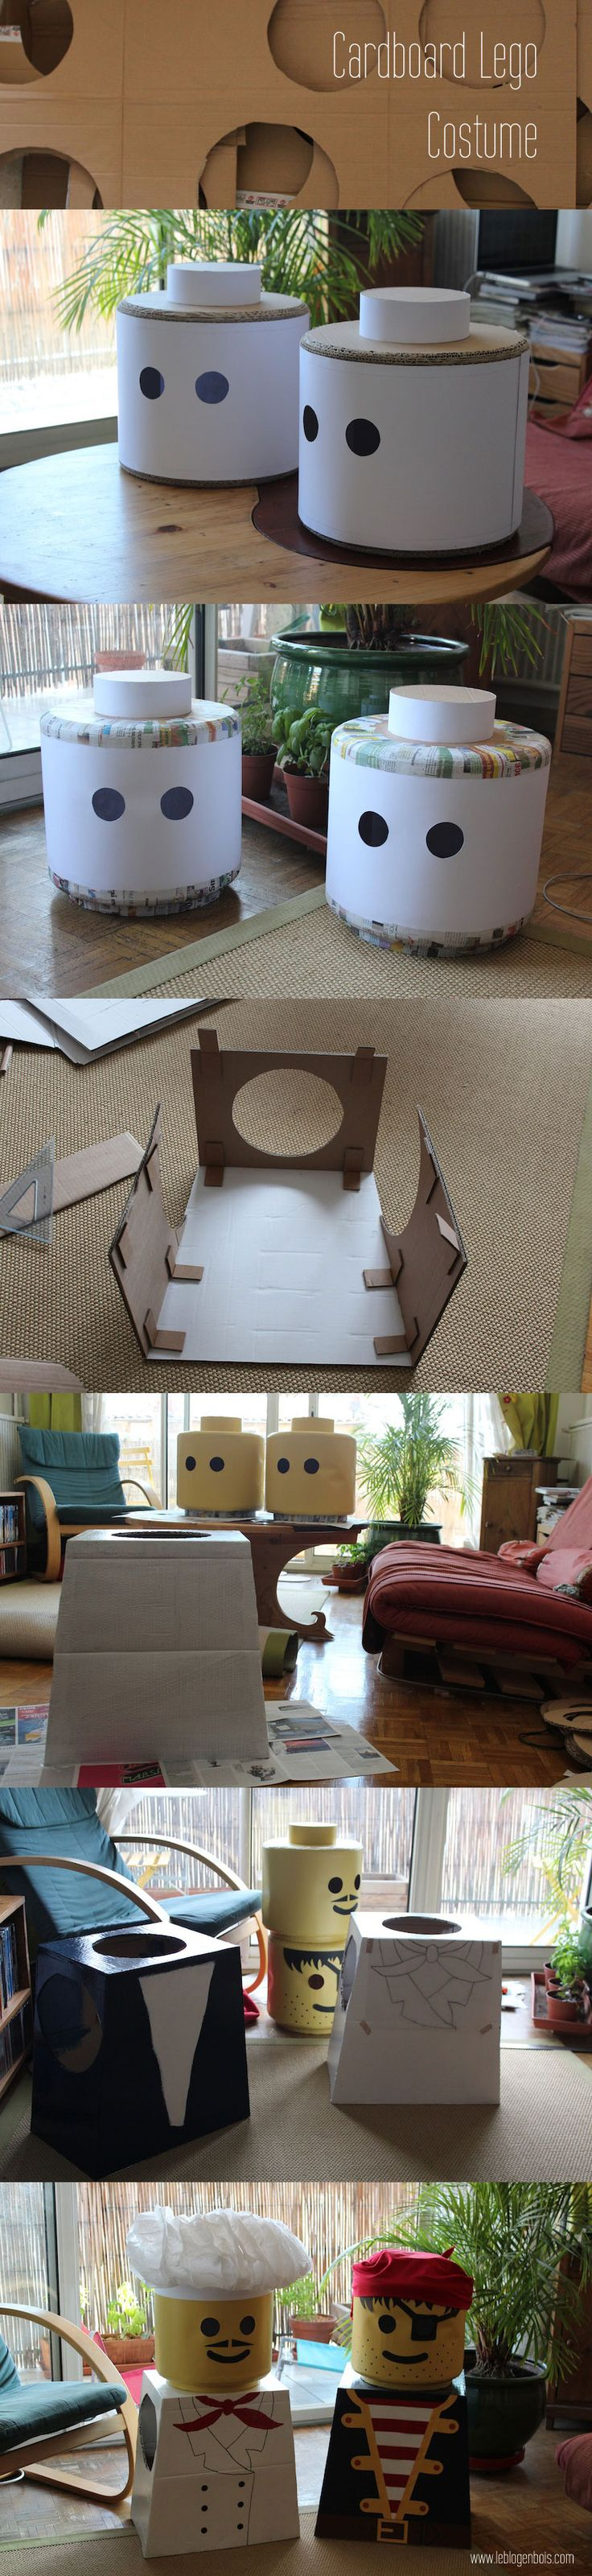 cardboard_lego_costume.jpg 800×3,480 pixels